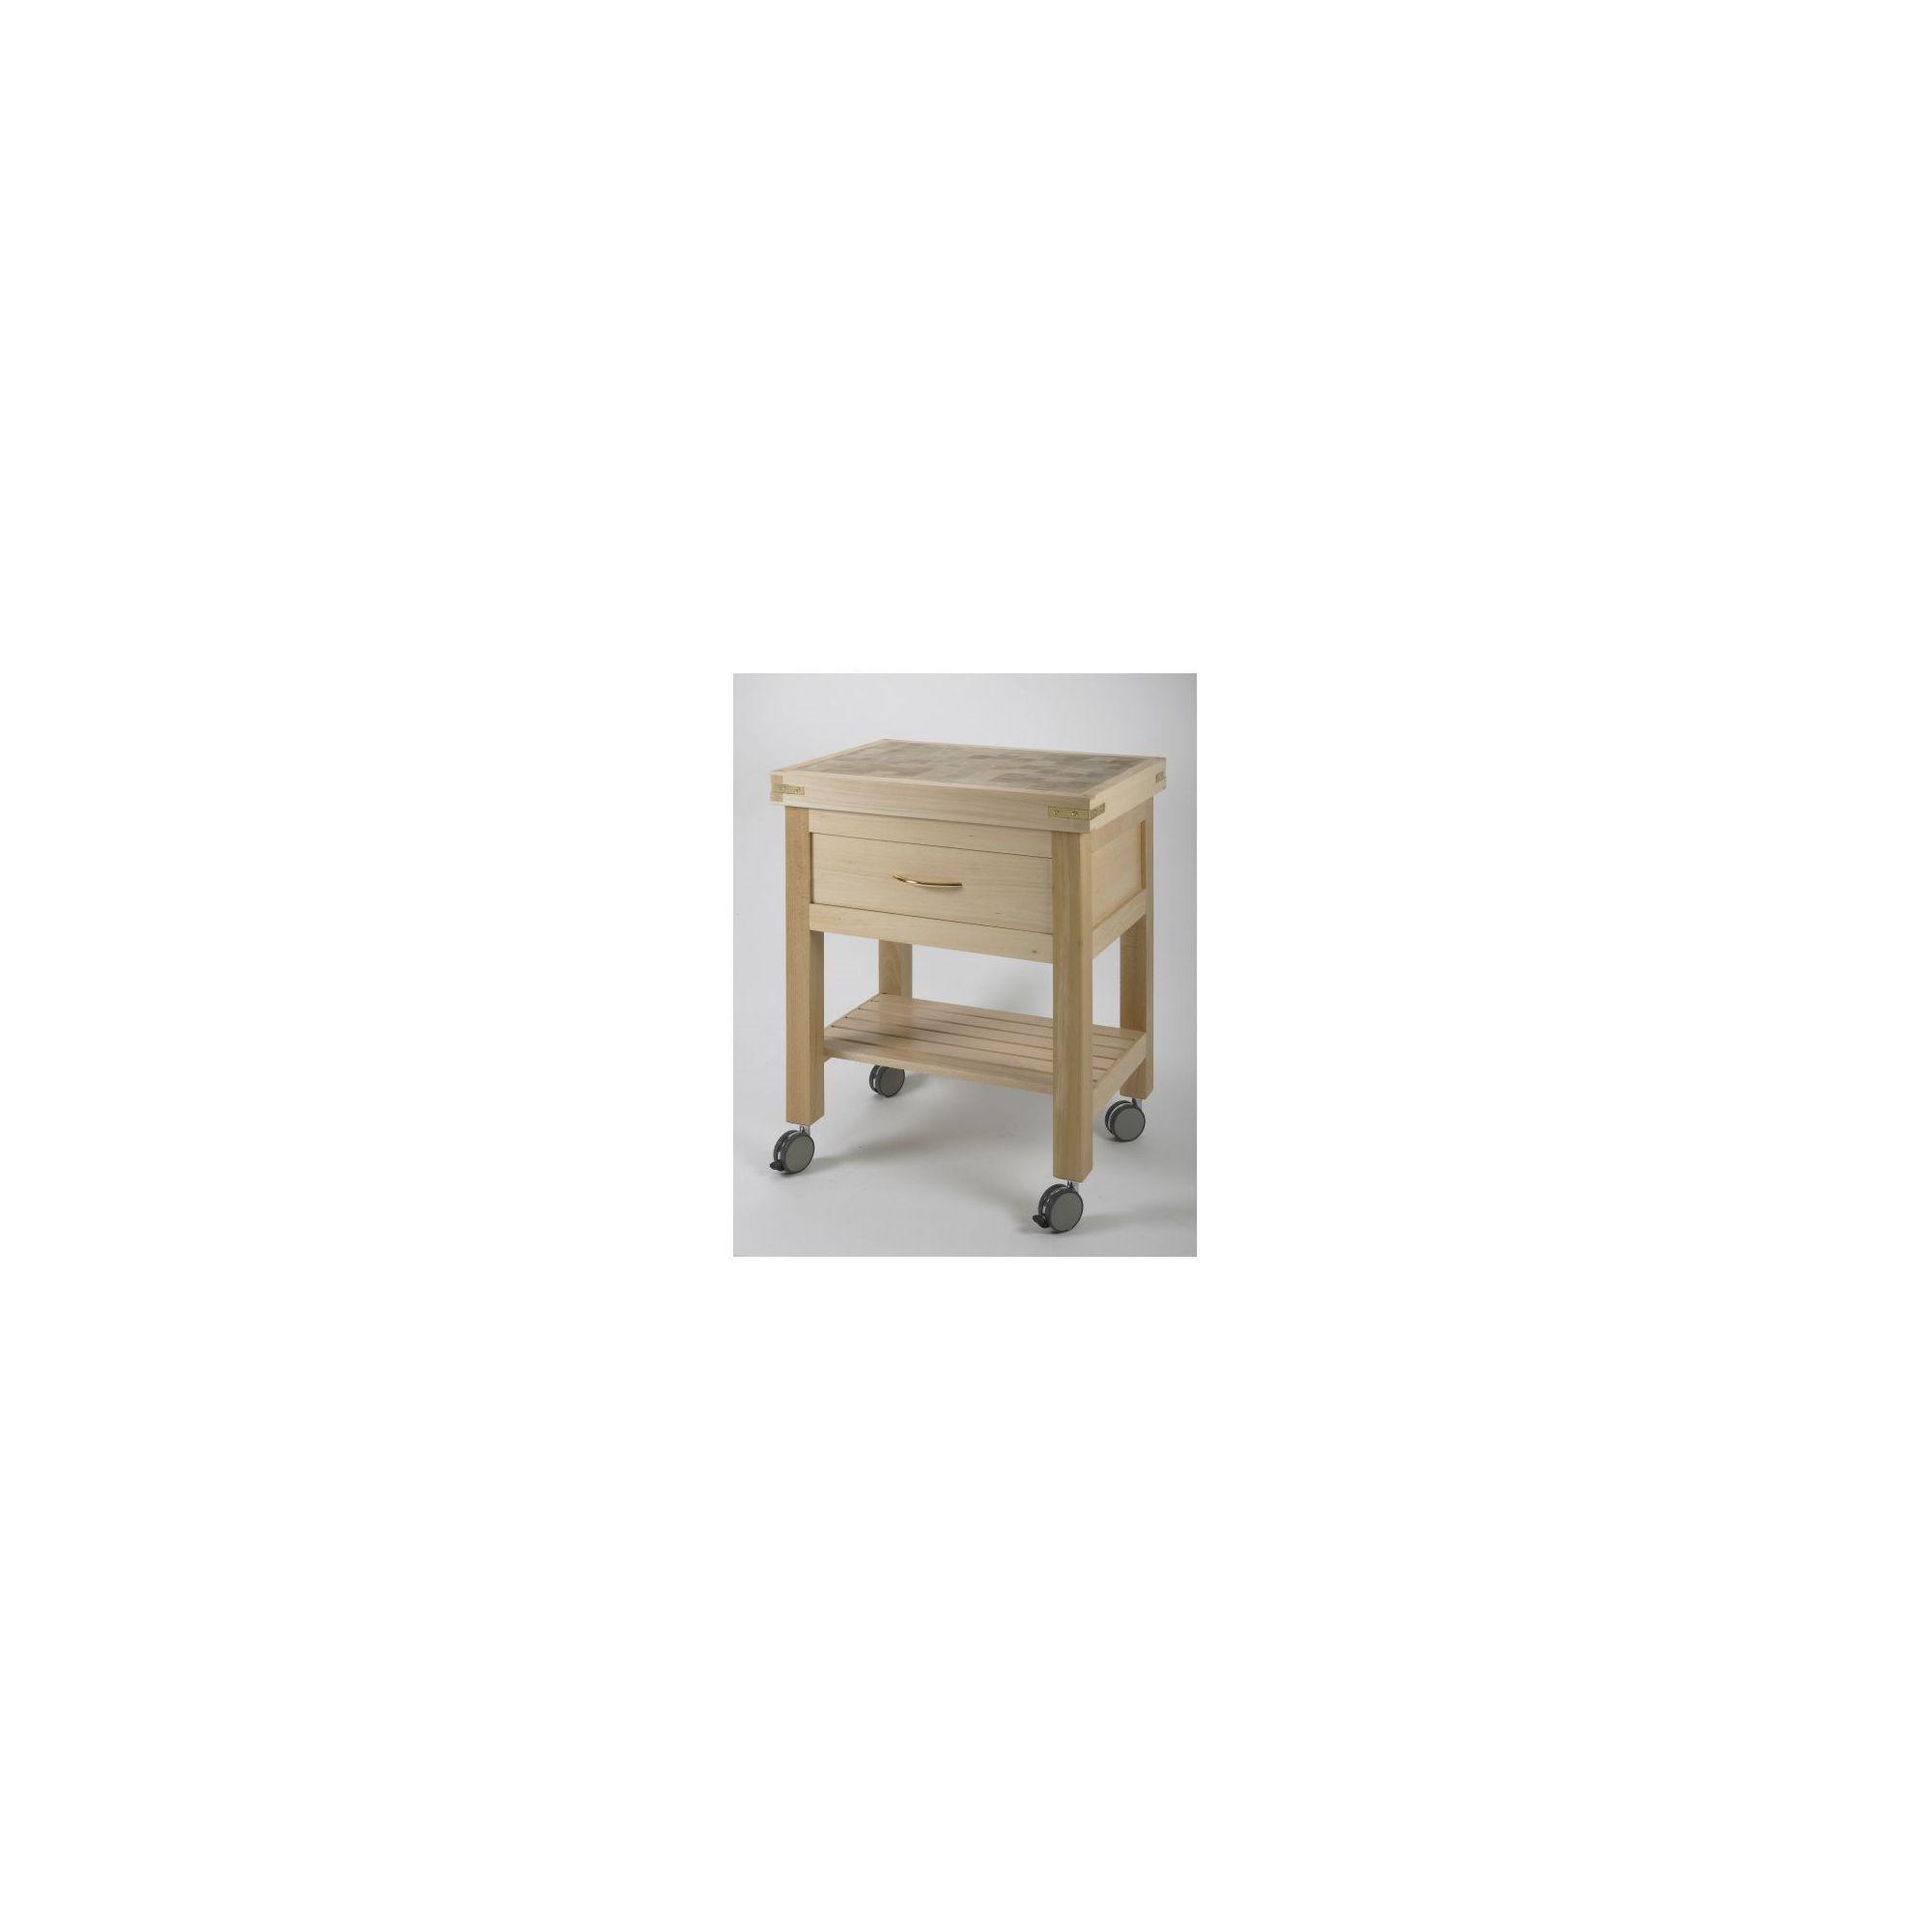 Chabret Kitchen Cart - 85cm X 50cm X 50cm at Tescos Direct